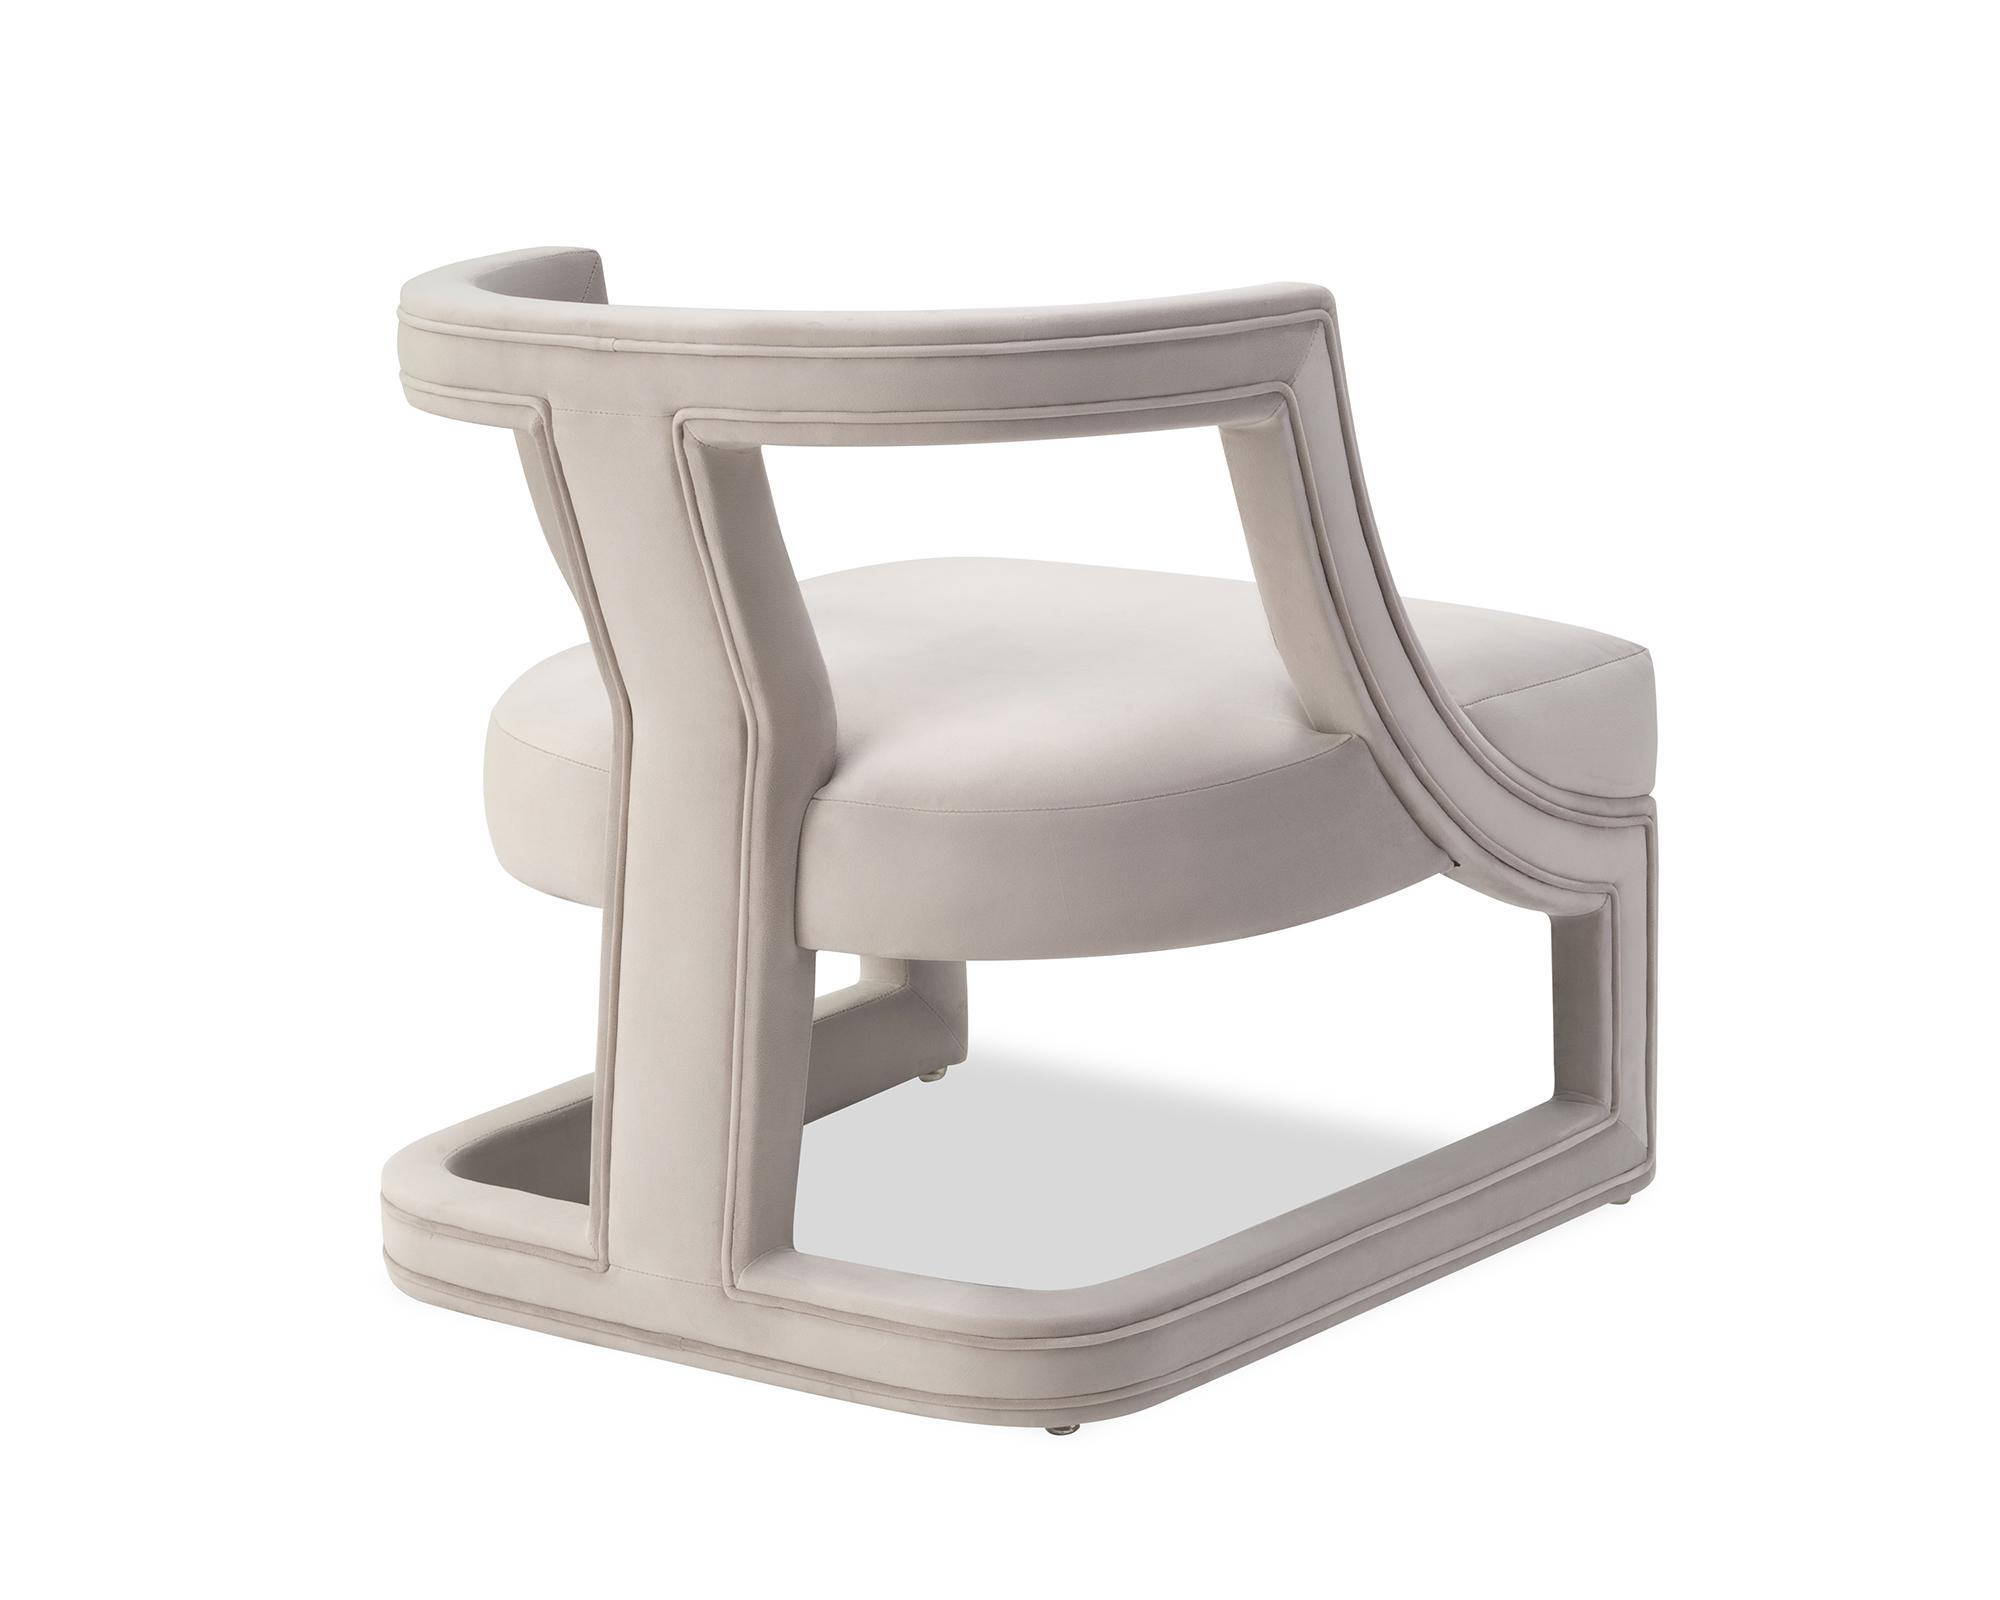 Liang & Eimil Jimi Occasional Chair Limestone Velvet BH-OCH-113 (1)